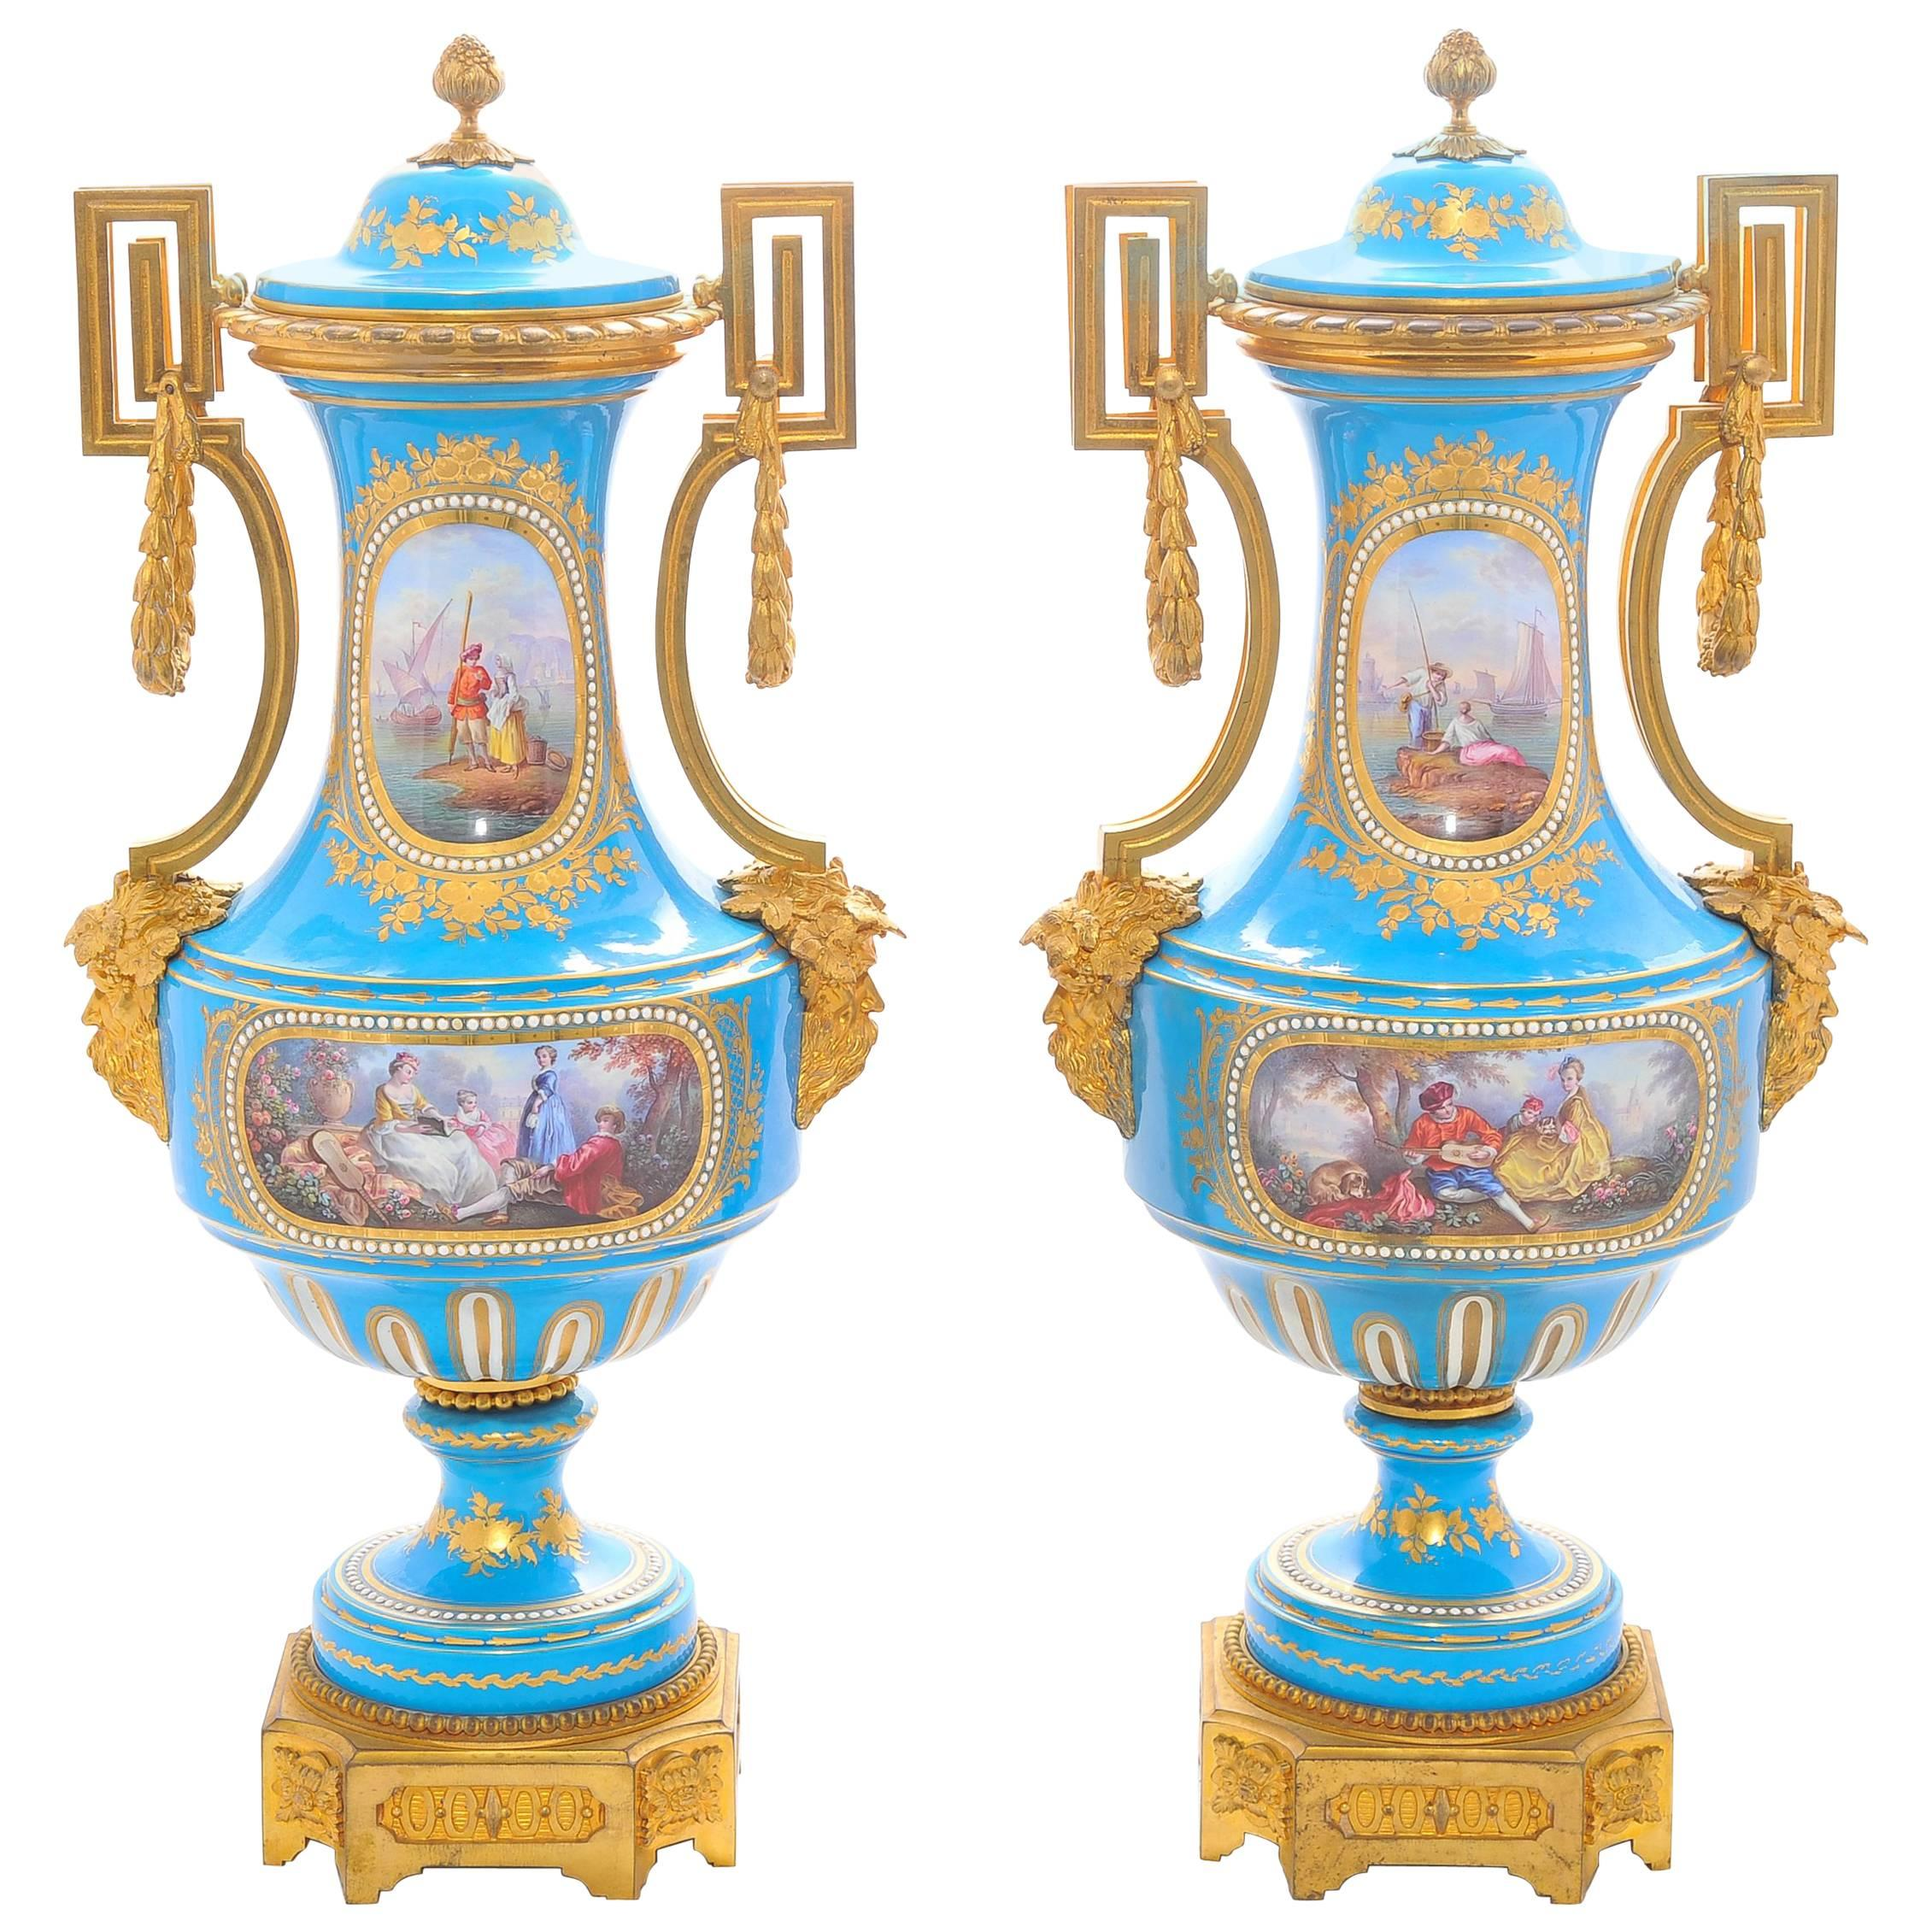 Pair of 19th Century 'Sevres' Classical Vases